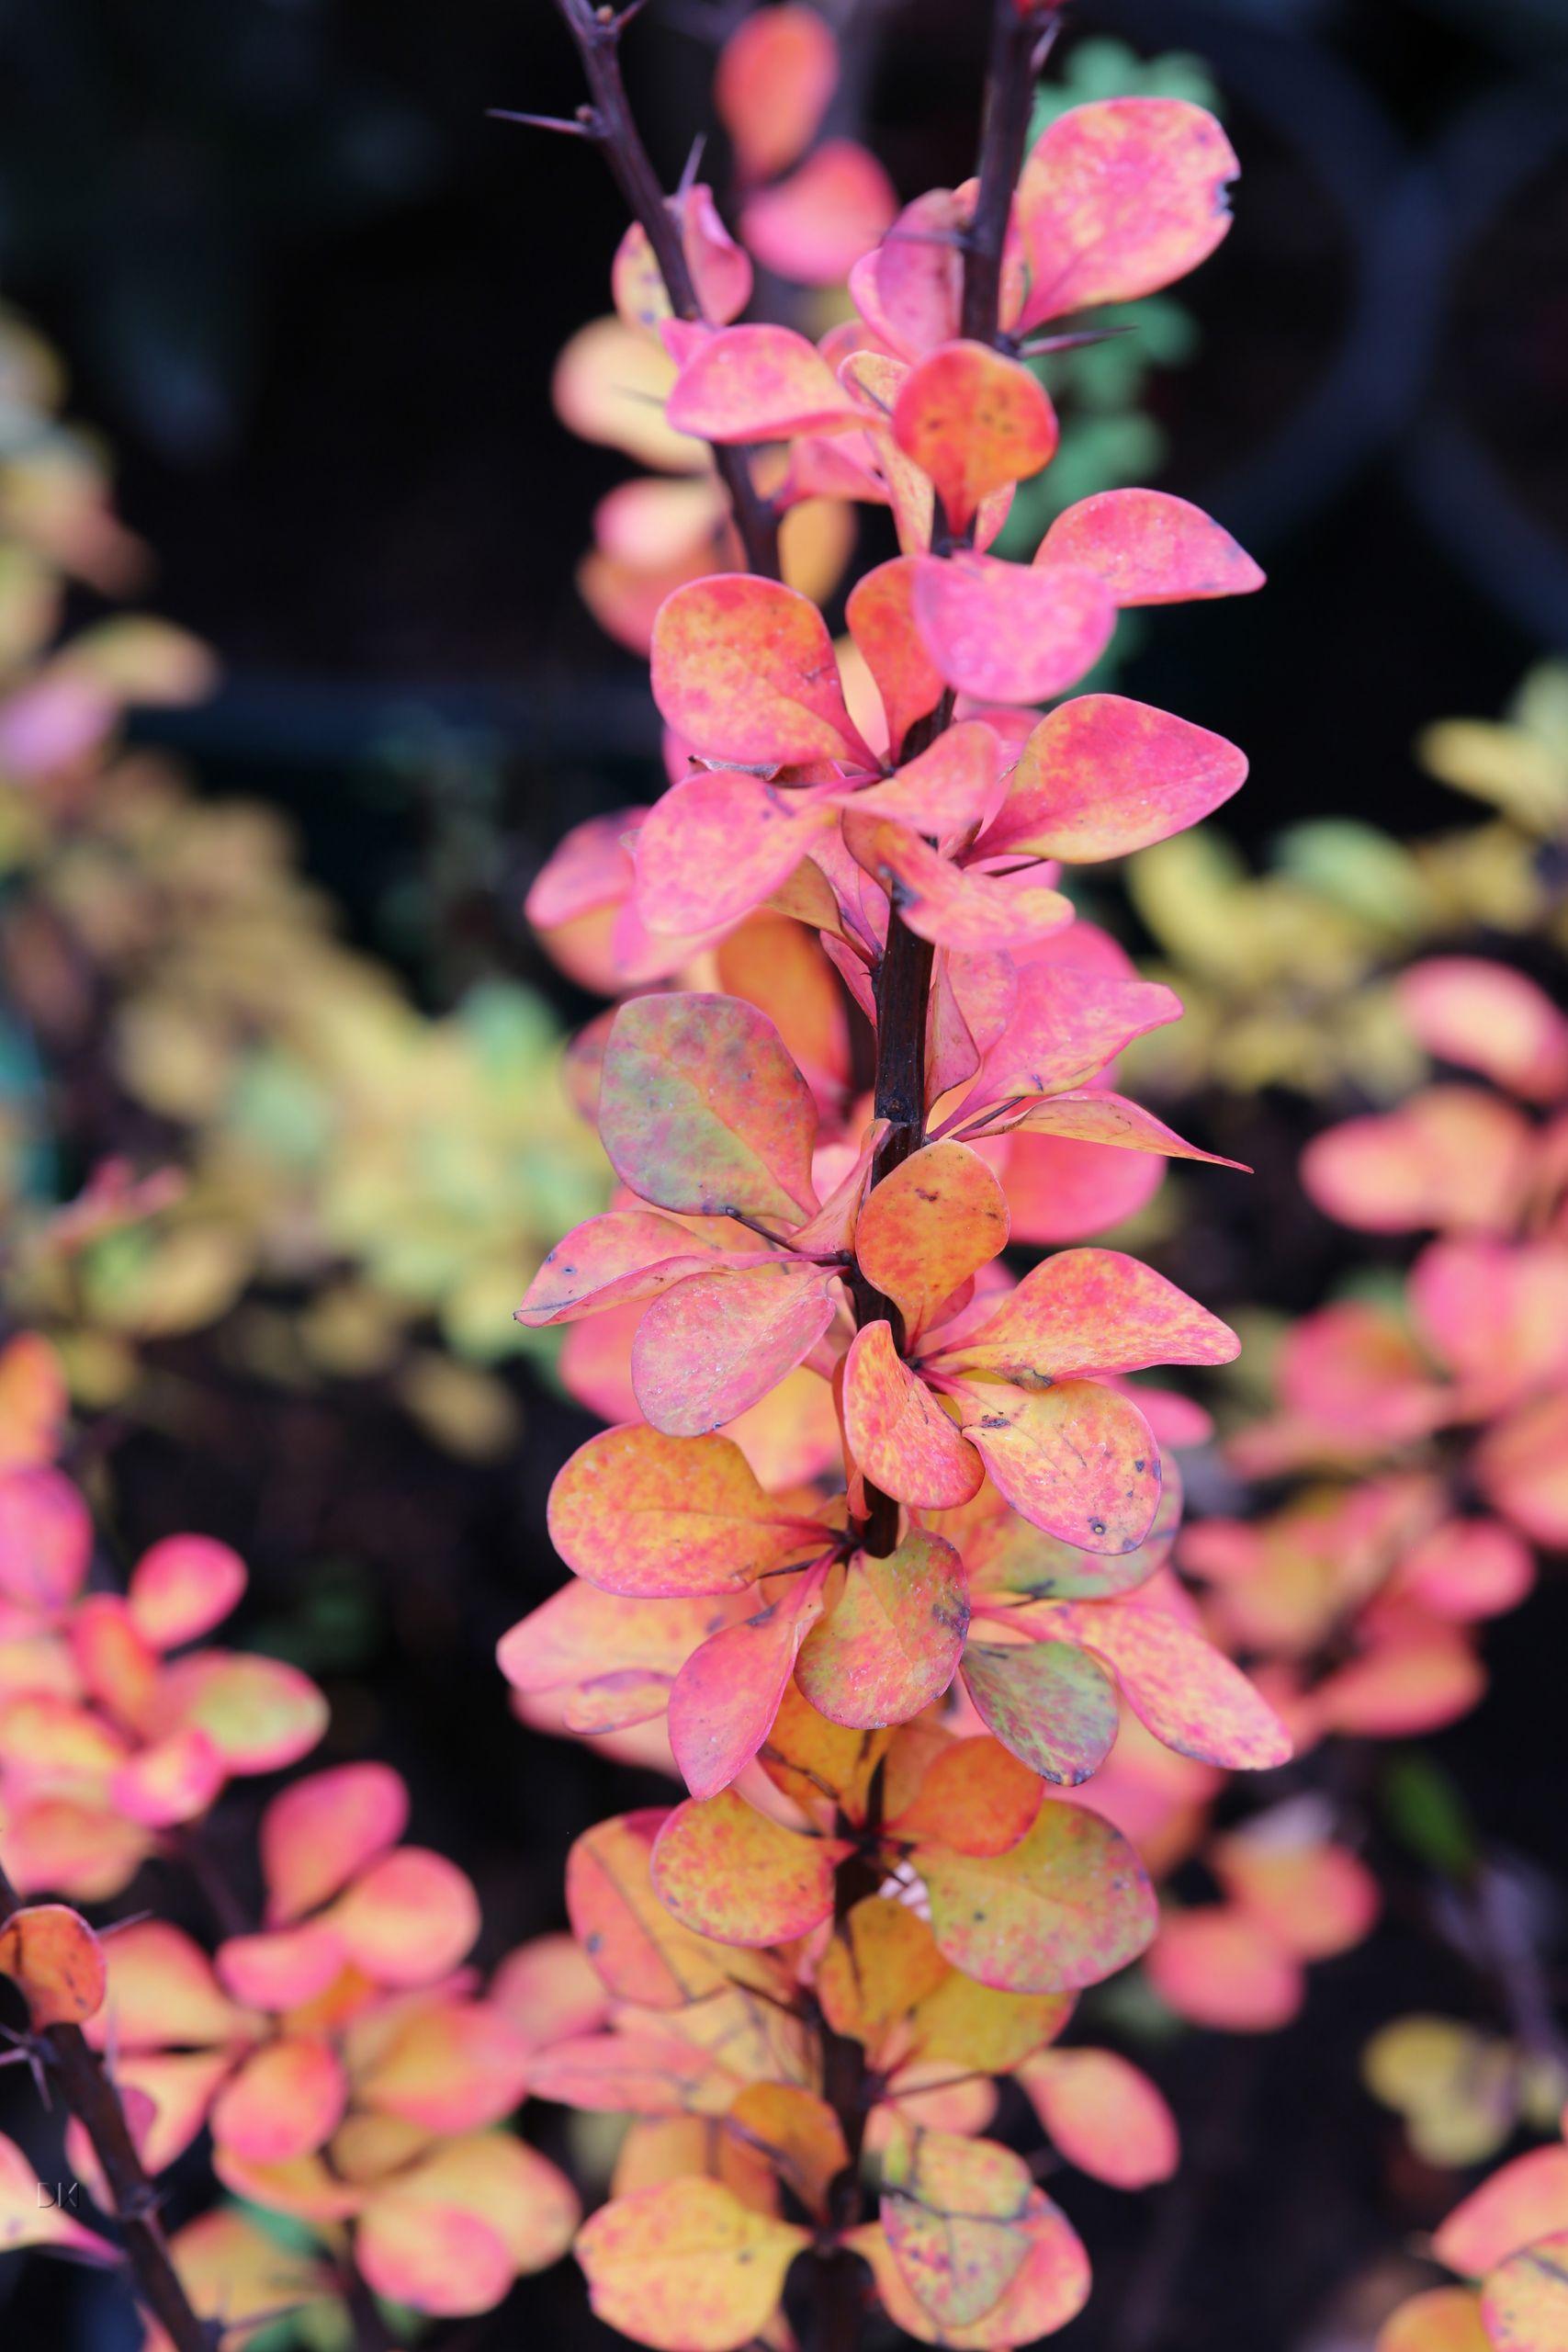 Berberis thunbergii Atrpurpurea Herbstfaerbung Detail 1S1B4261bSg1XTSsOqMch